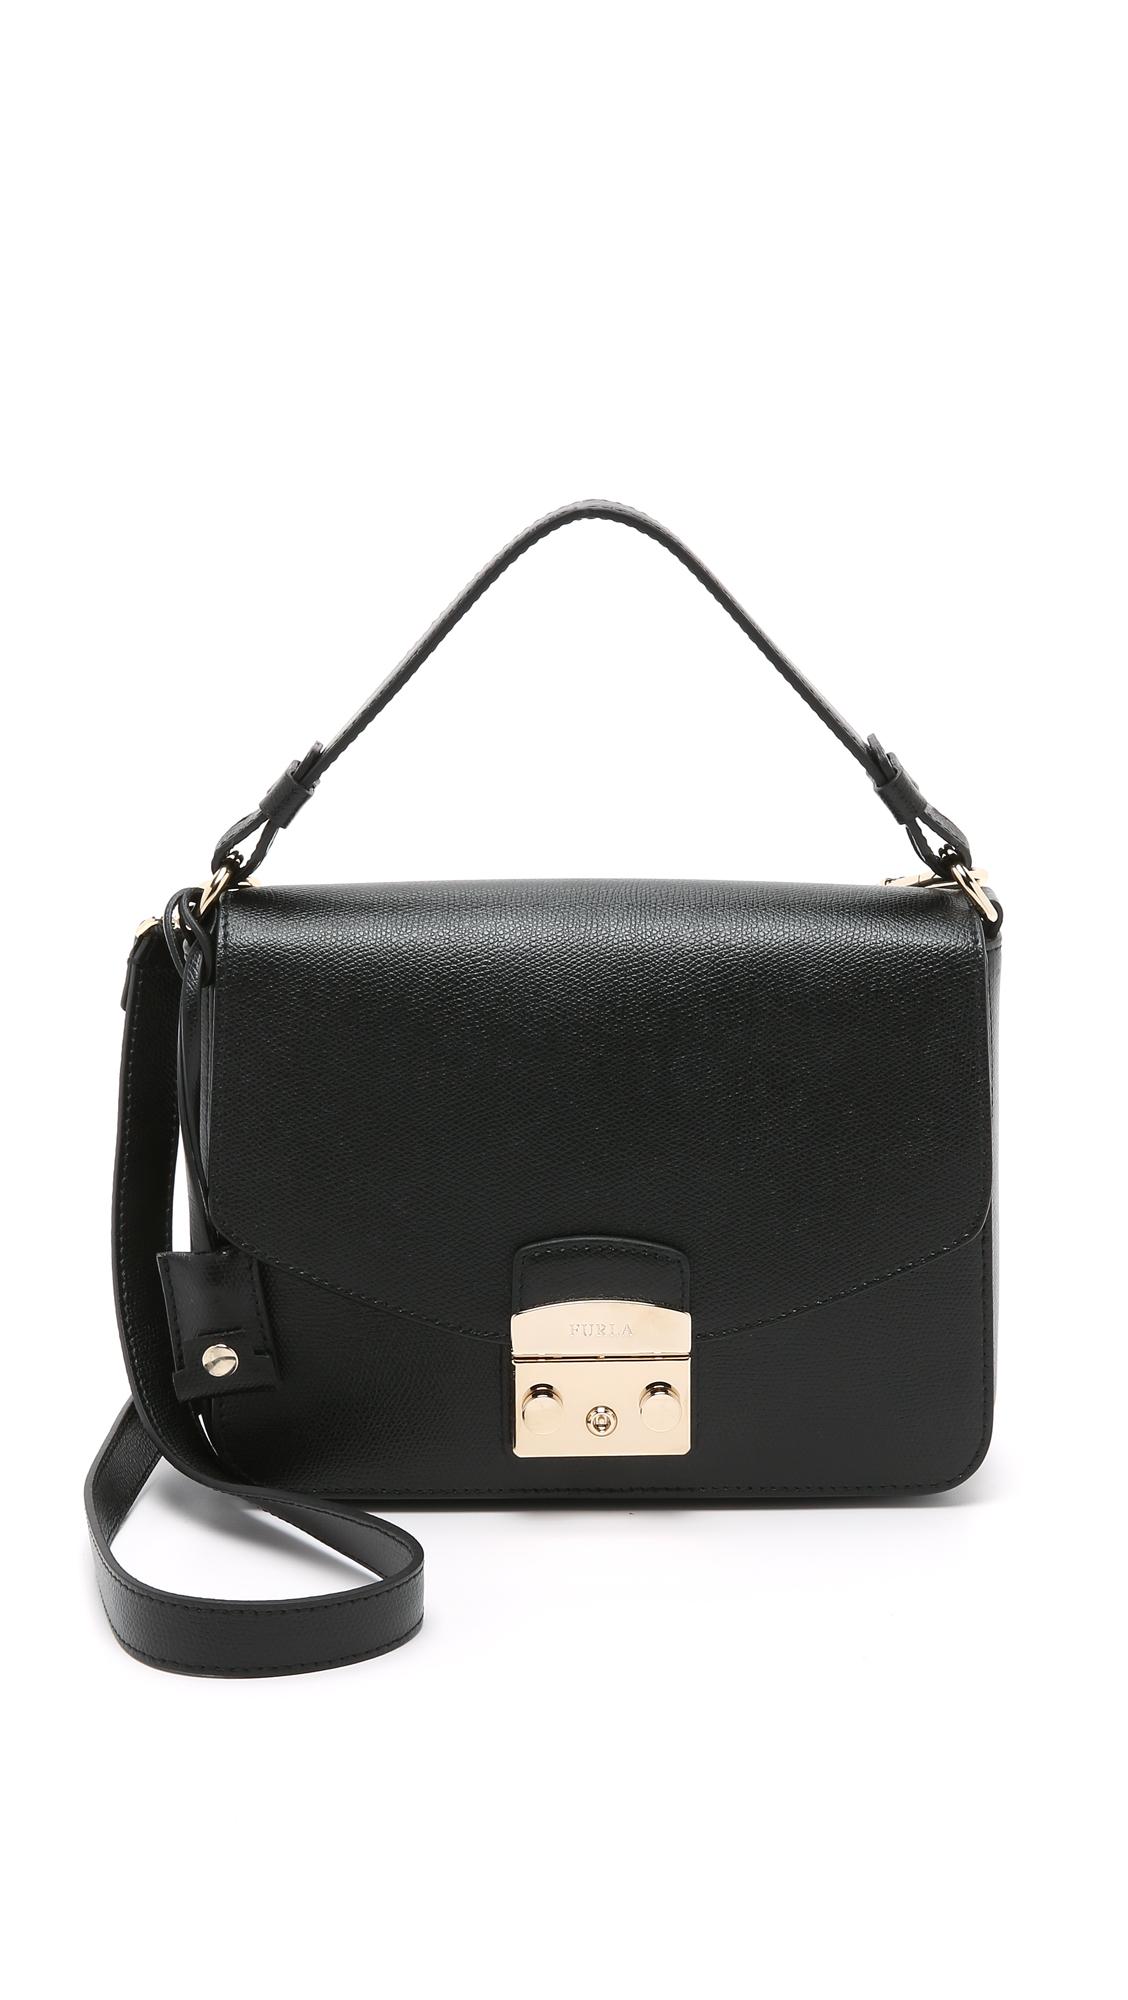 Furla Metropolis Small Shoulder Bag in Black - Lyst e3e2baa4d8e35